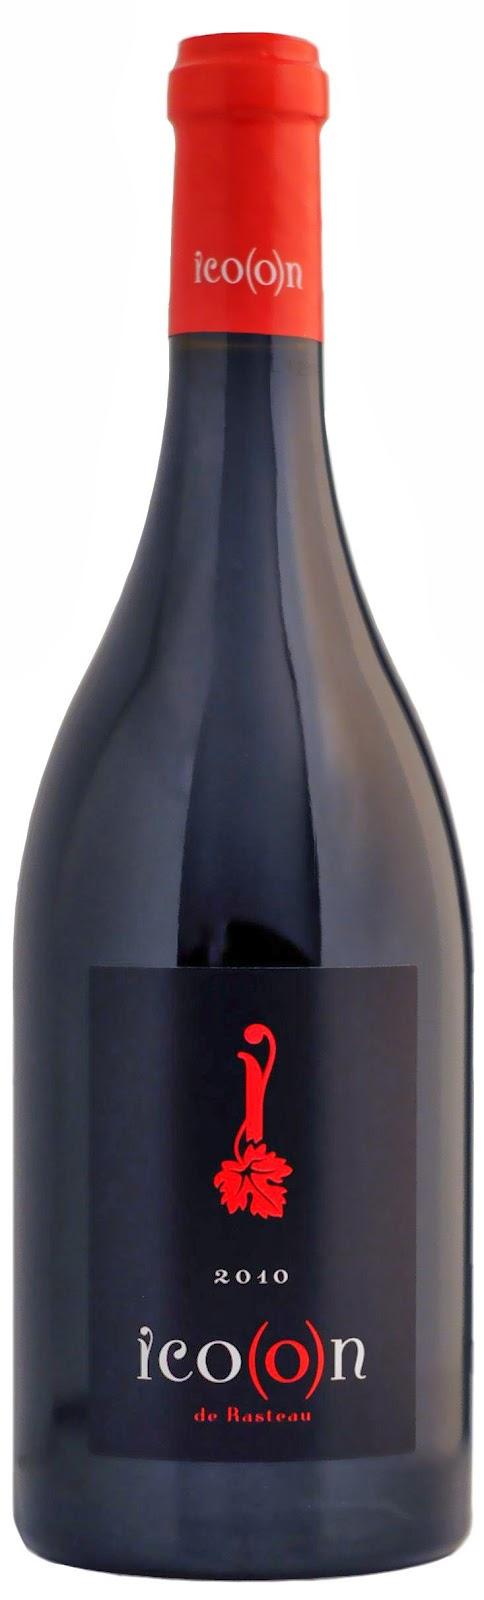 icona vino rosso grenache granaccia packaging naming ricerca nome bottiglia red